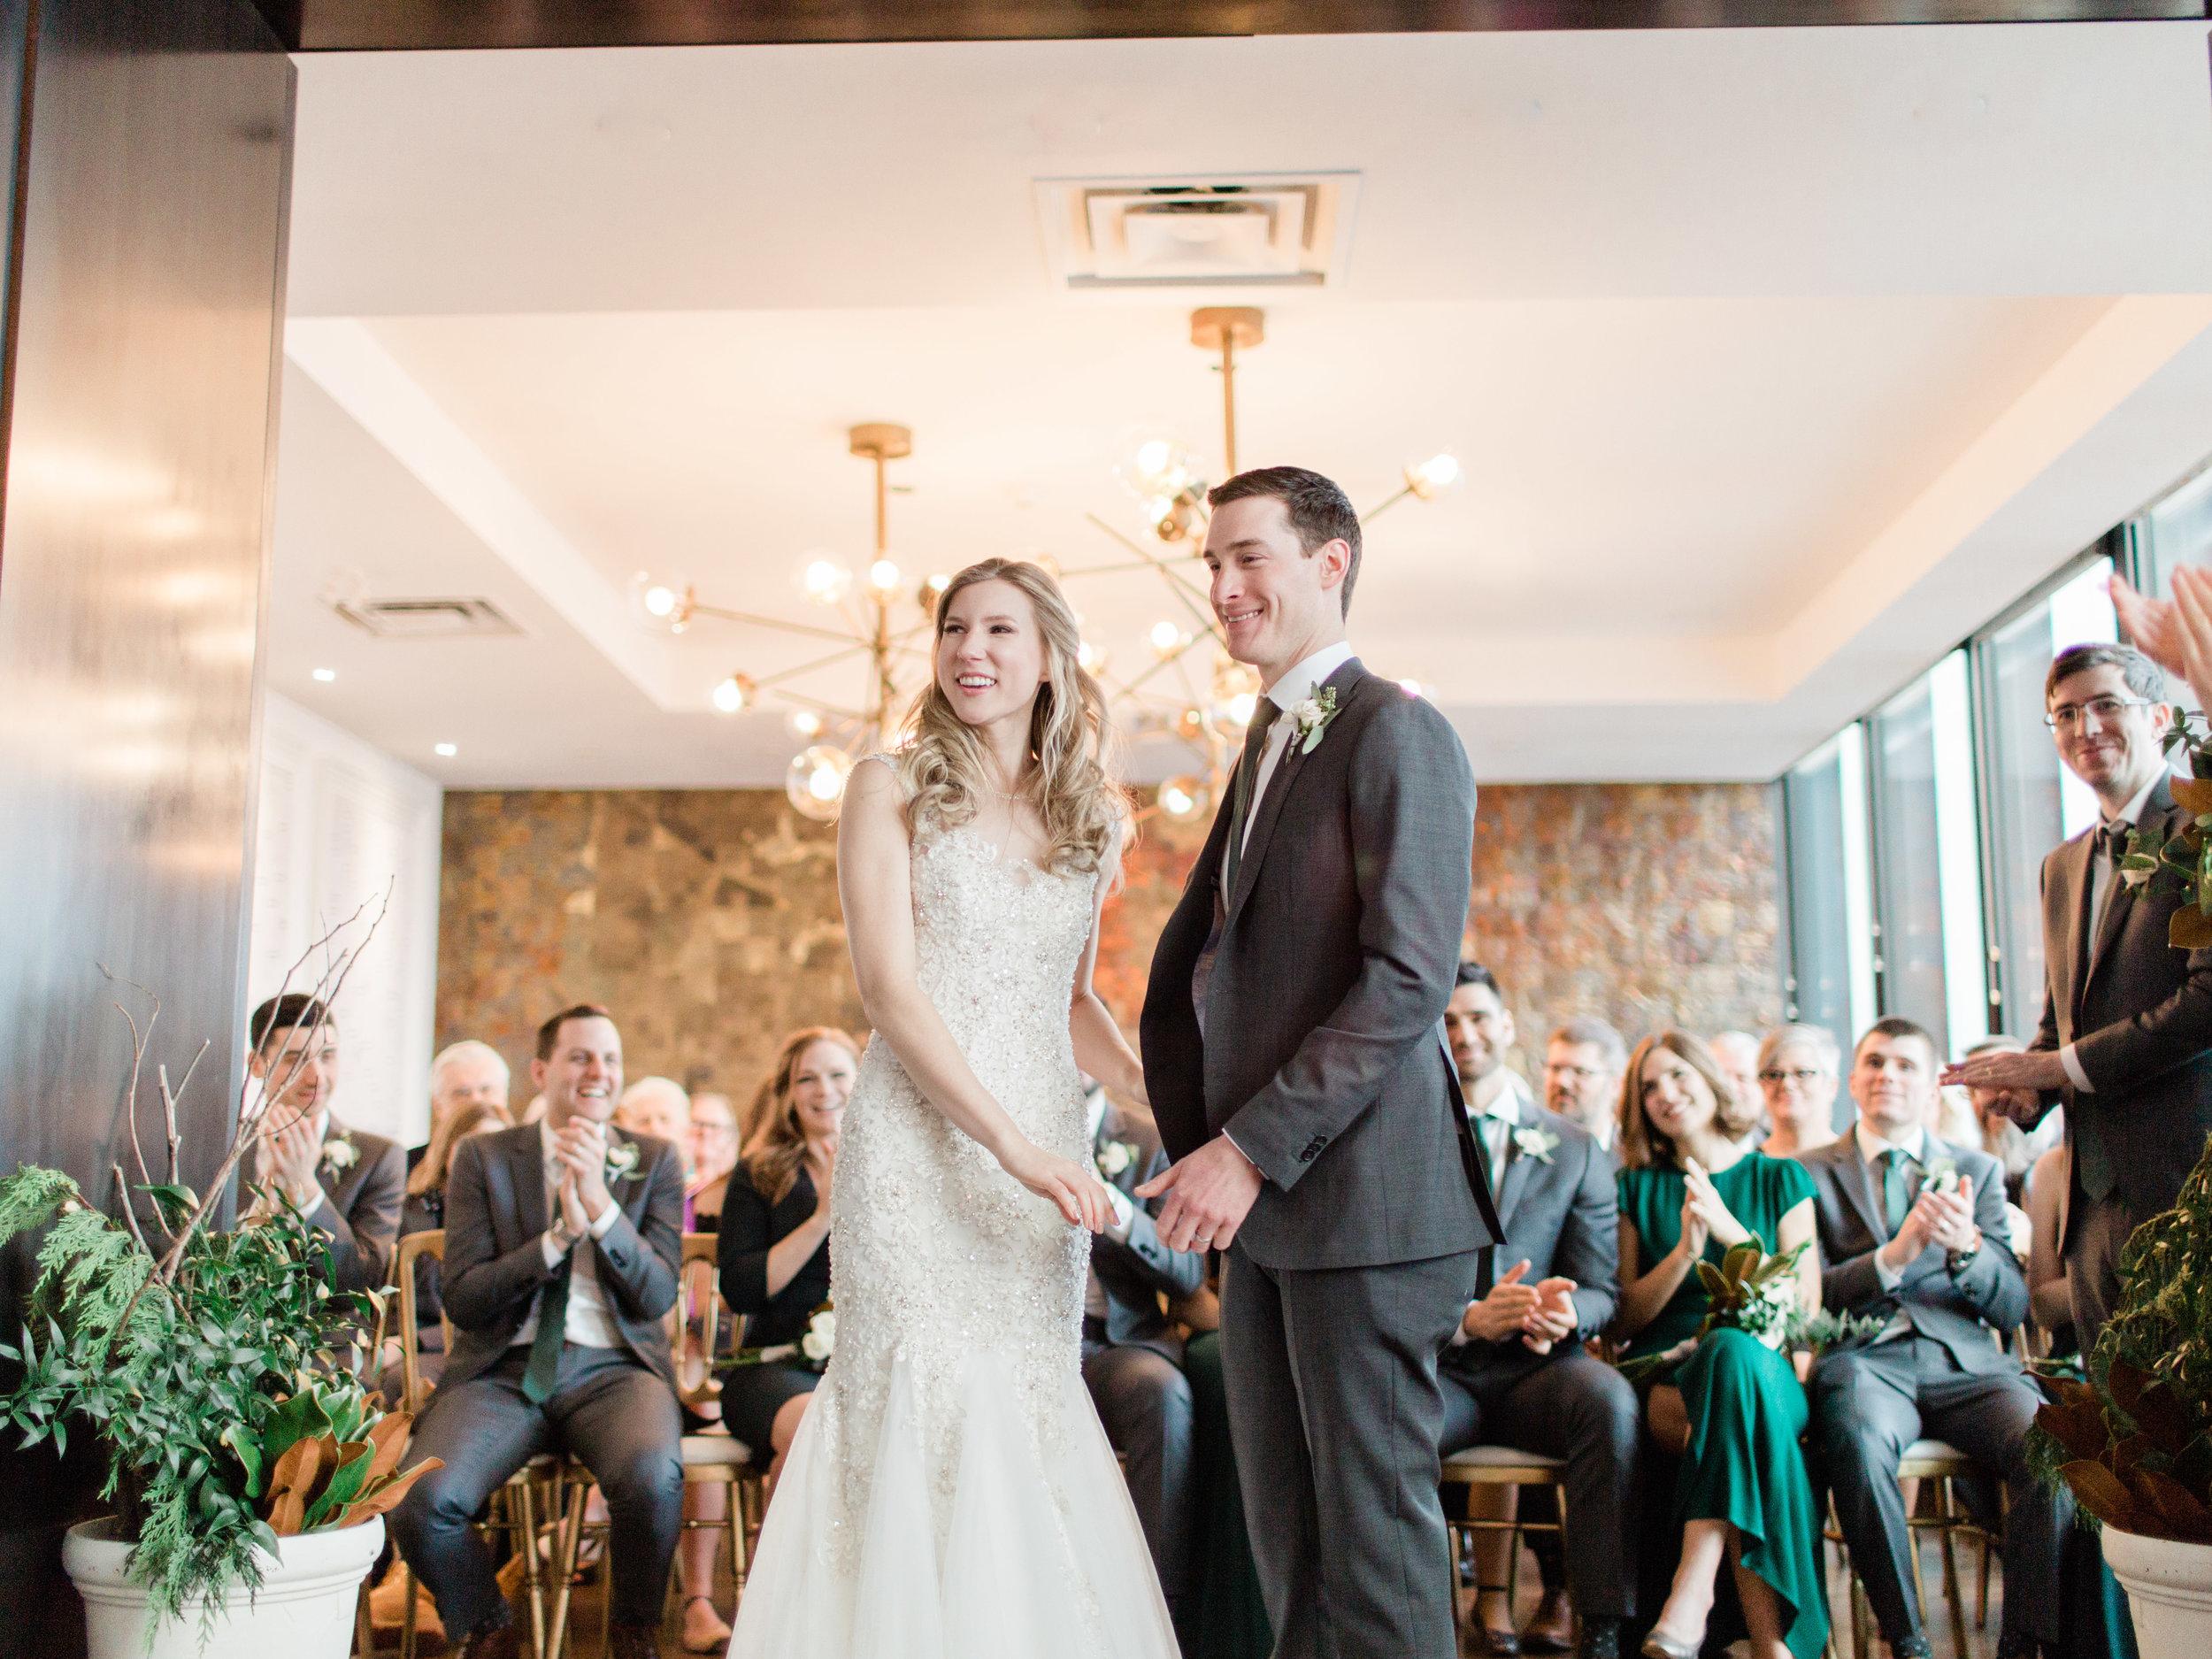 An elegant winter wedding in downtown Toronto at Allen Gardens and Canoe Restaurant, by toronto wedding photographer corynn fowler photography